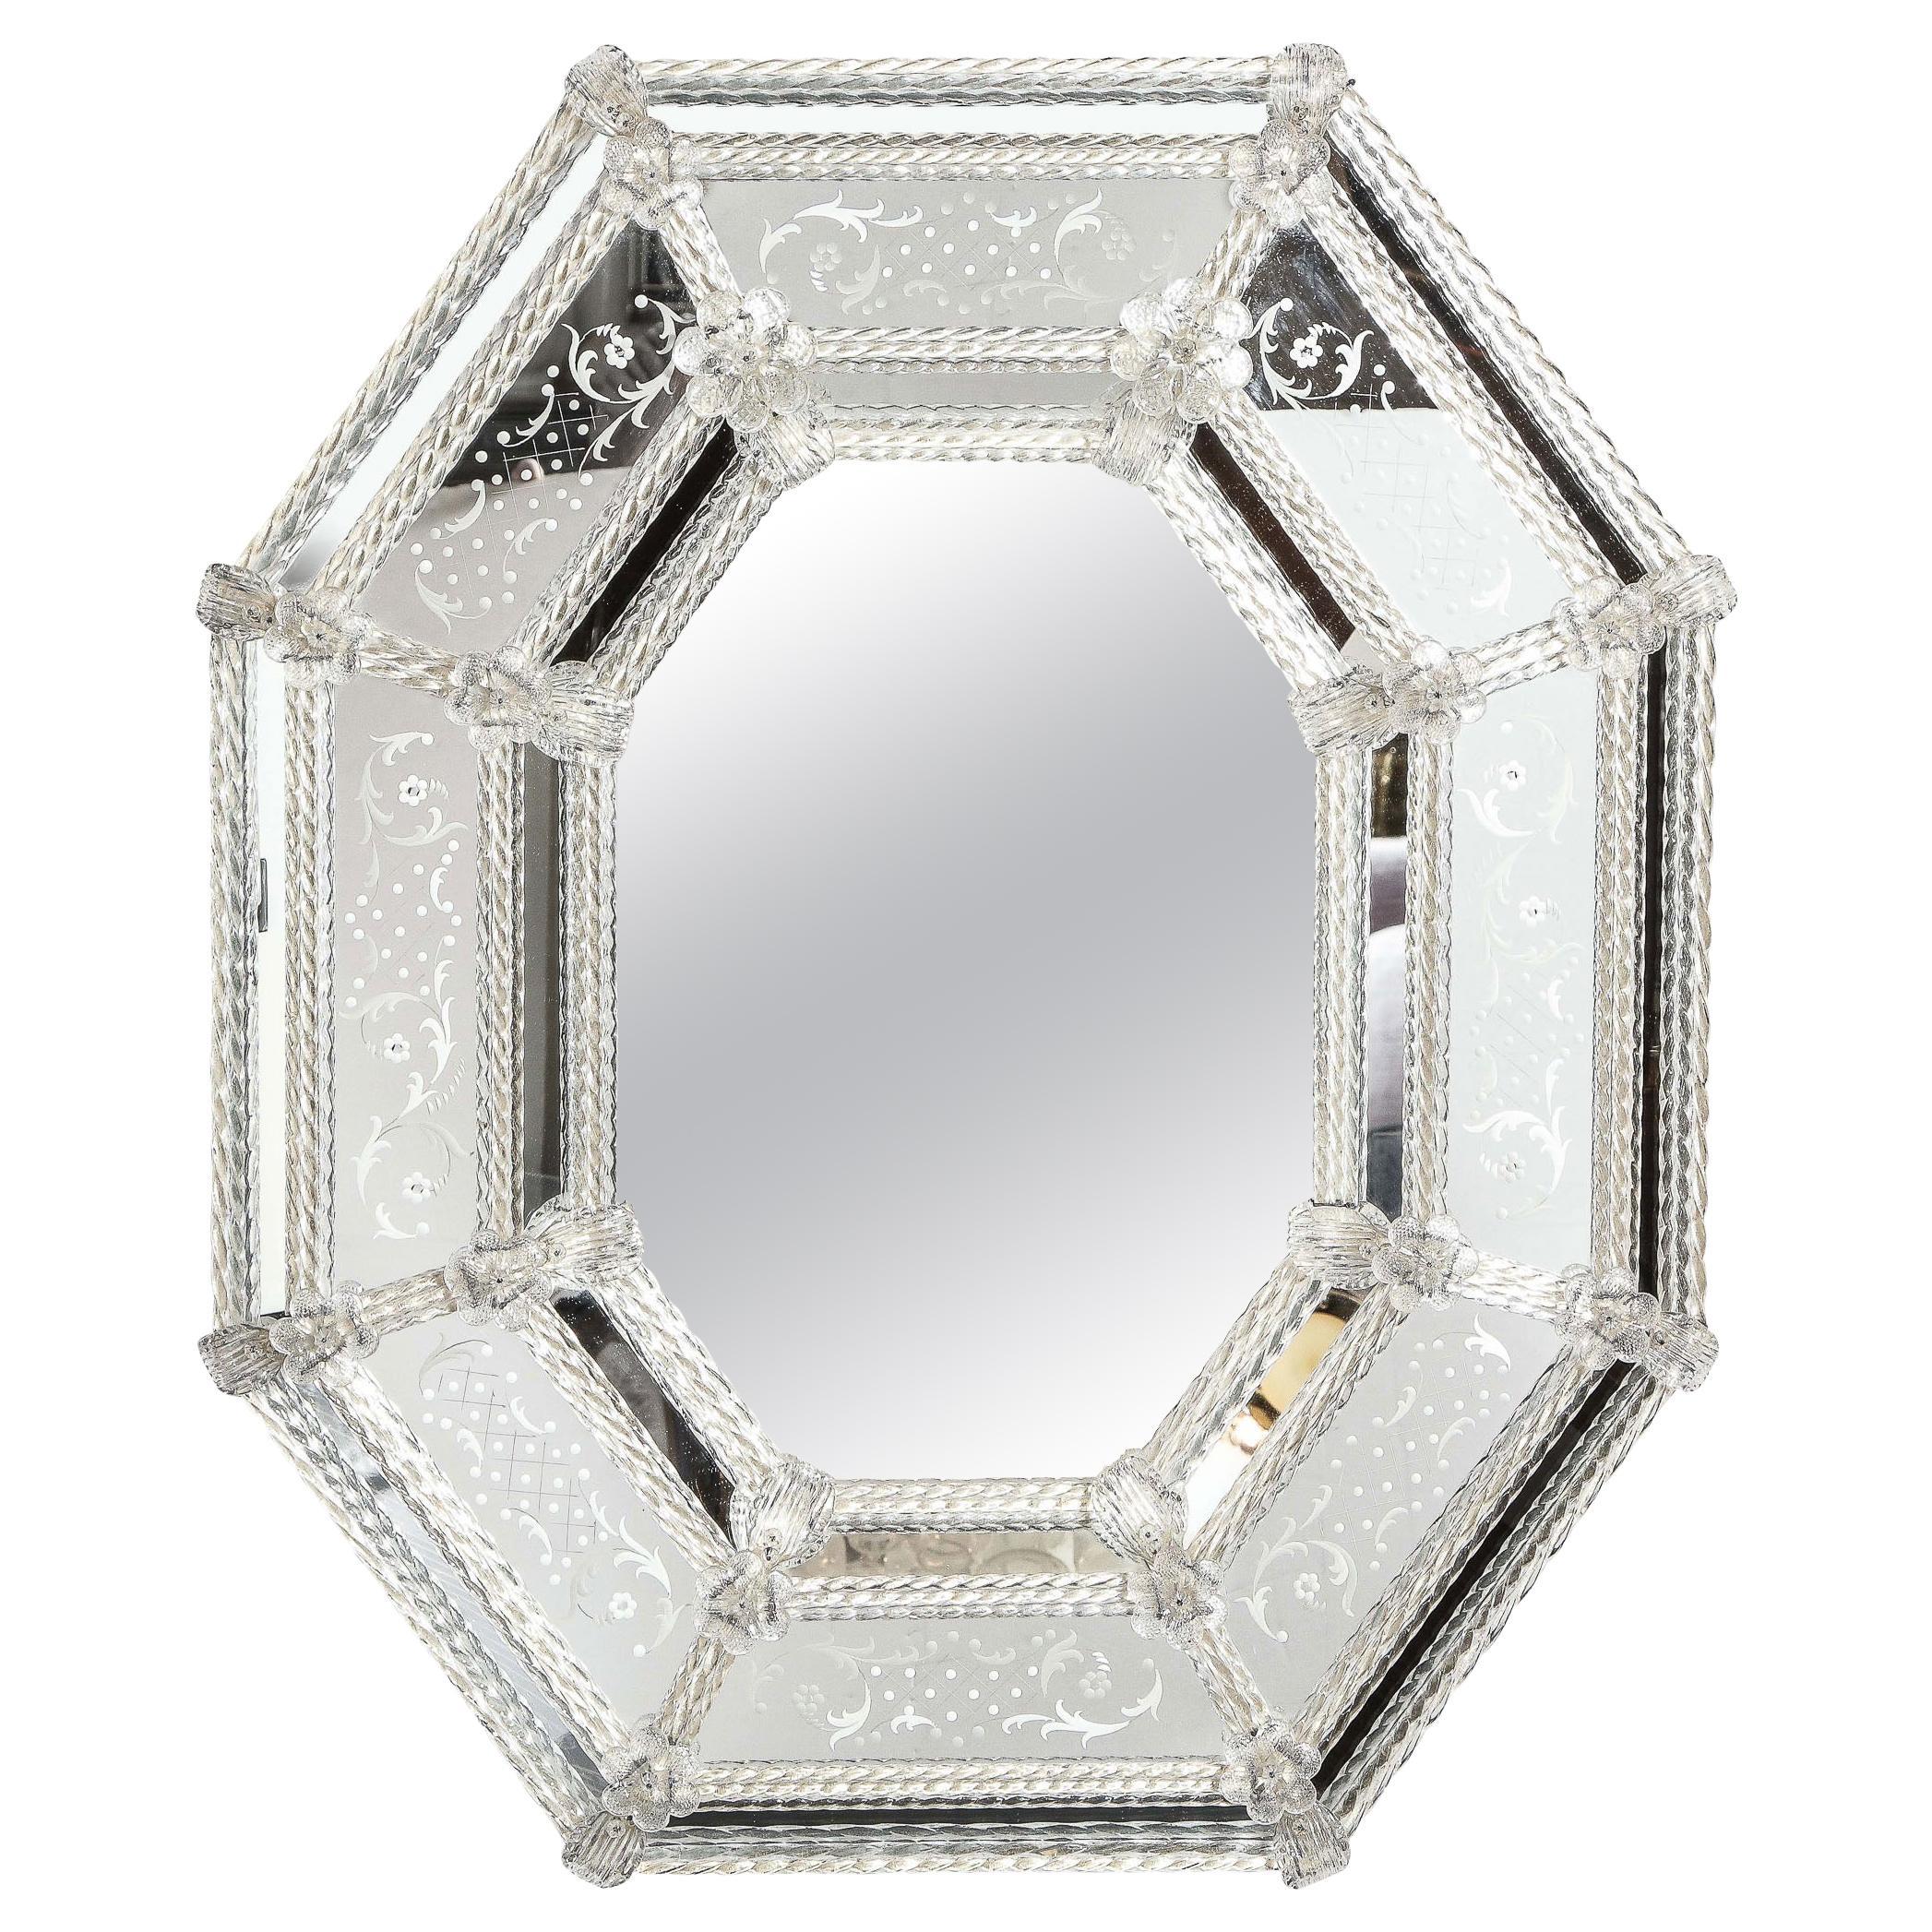 Italian Mid-Century Modern Venetian Braided Mirror with Murano Glass Appliqués